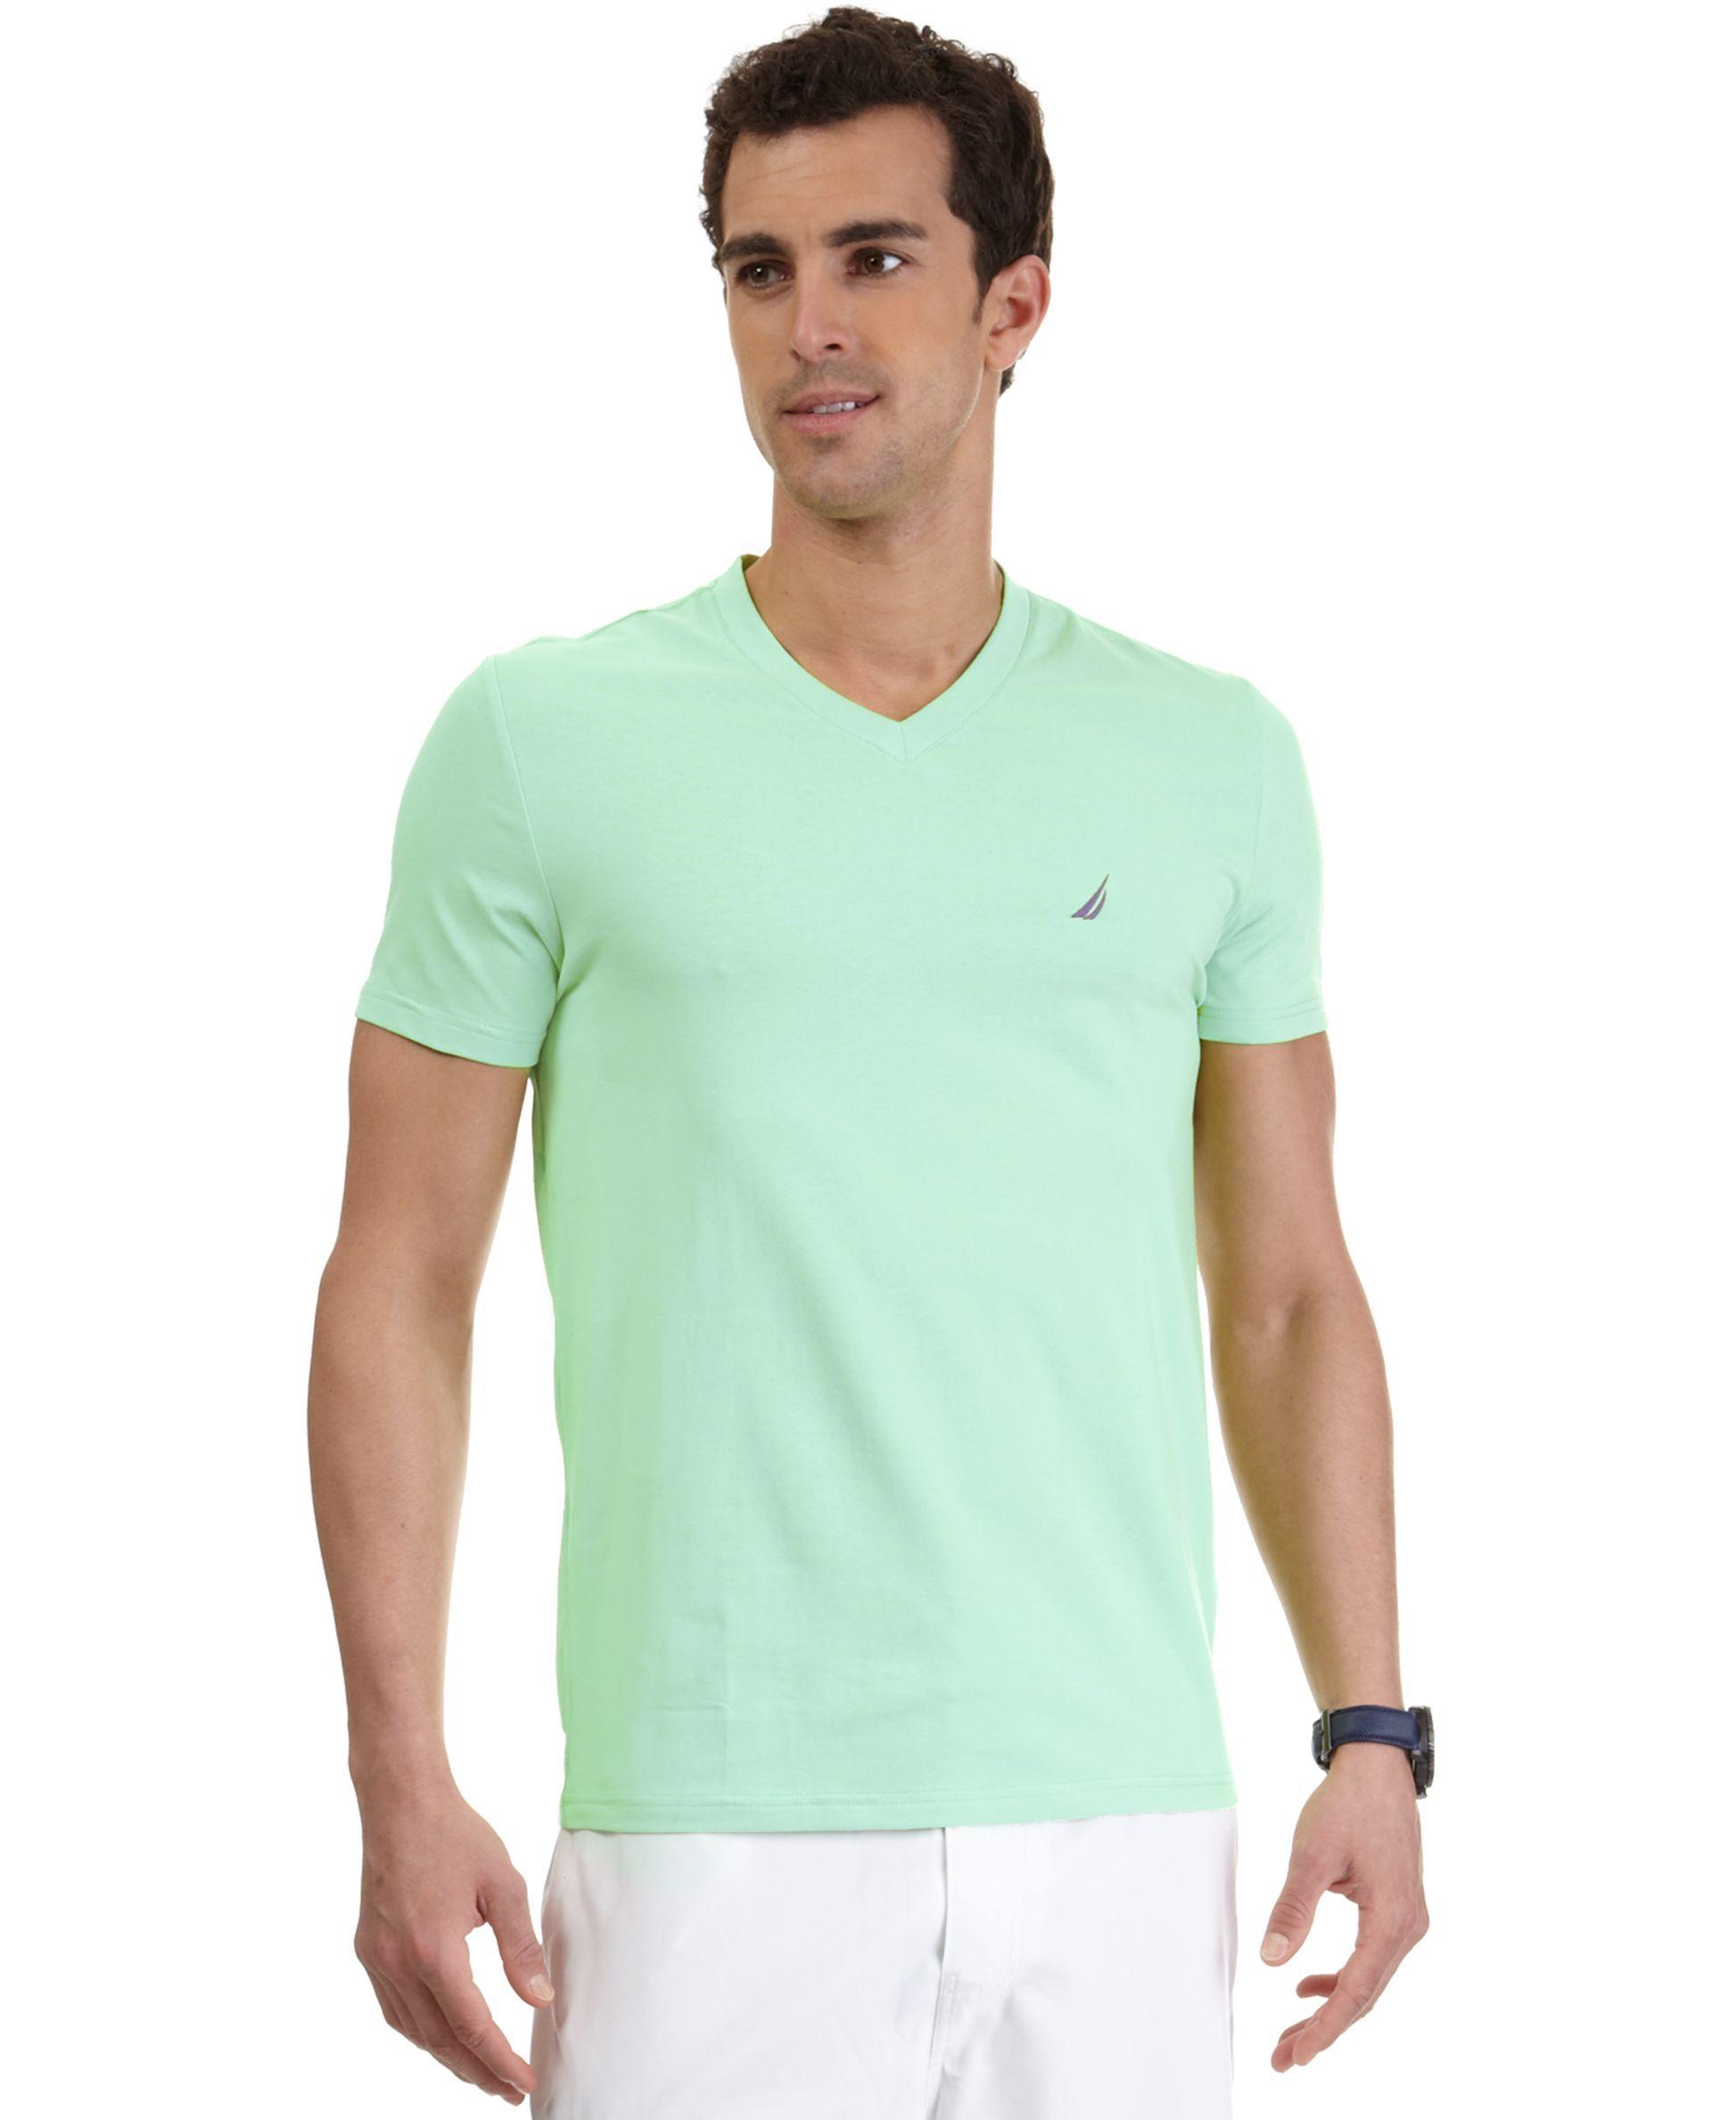 84823d9a Nautica Solid V-Neck T-Shirt | Products | T shirt, Shirts, V neck t ...